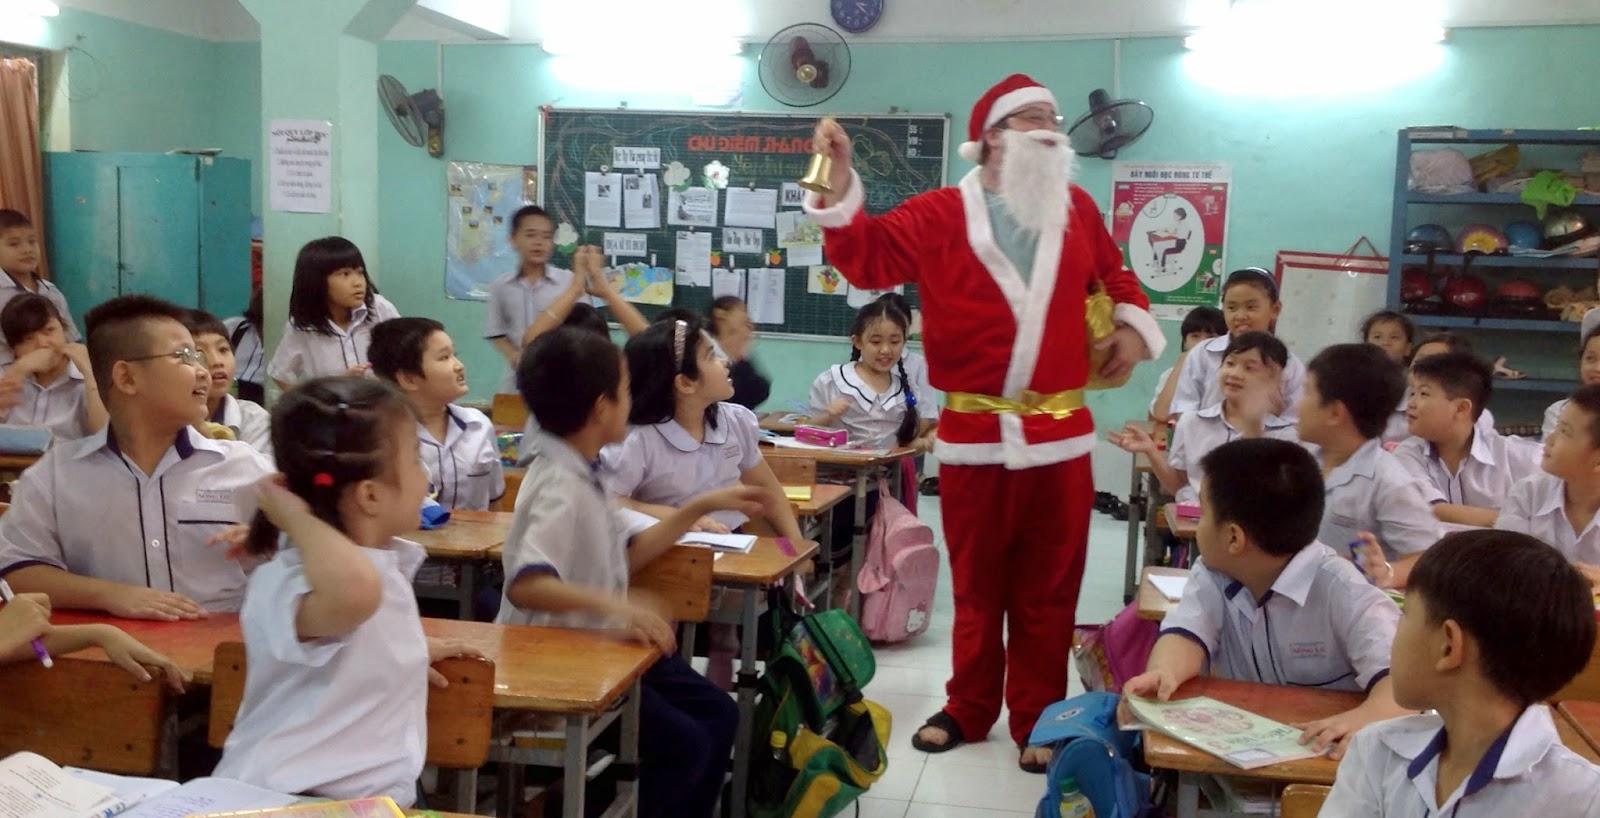 A Ben Abroad: 6 Cringey Vietnamese Christmas Songs